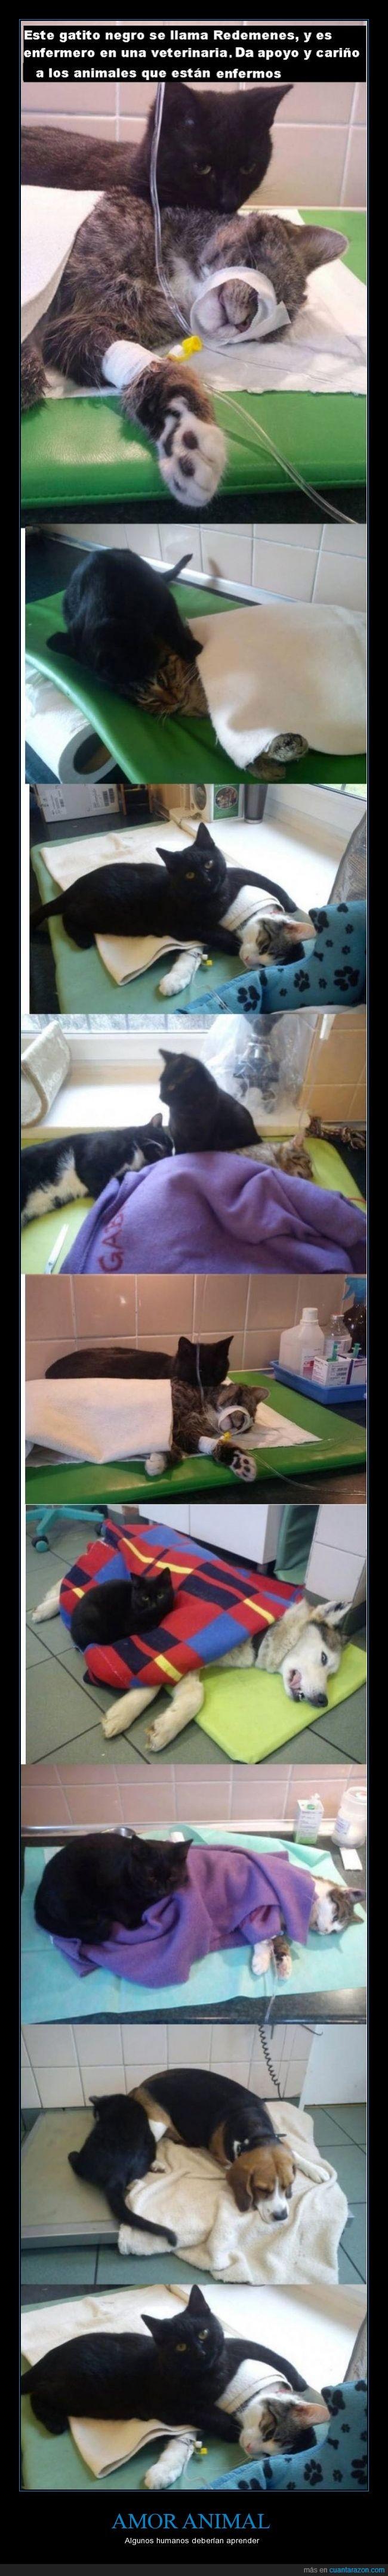 amor,ayuda,curar,enfermero,gatos,humano,mascota,veterinaria